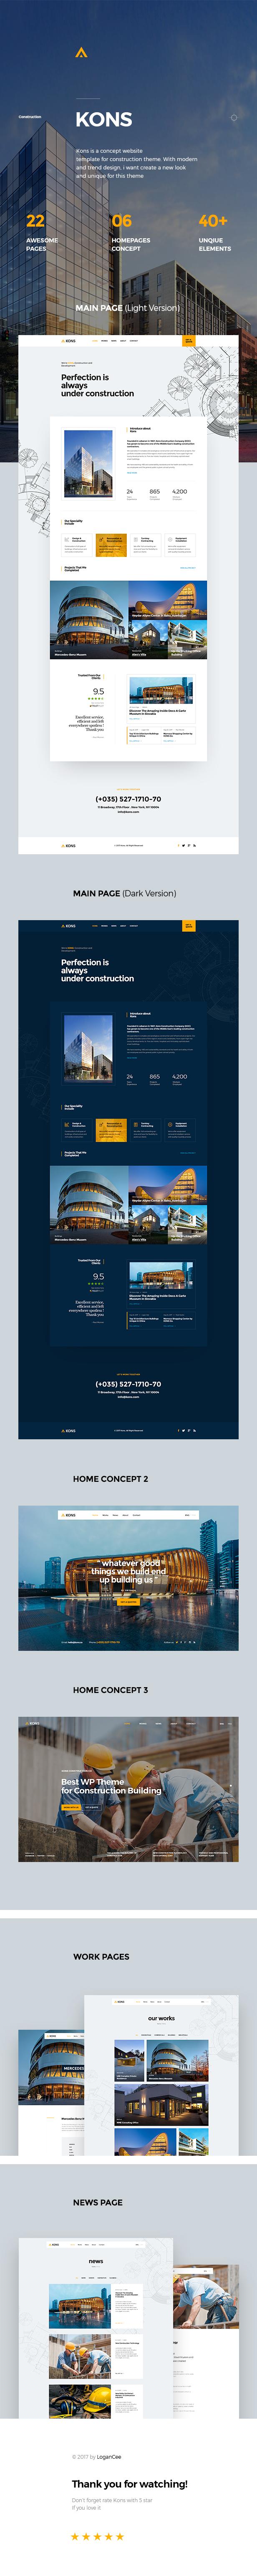 Kons - Construction and Building WordPress Theme - 5